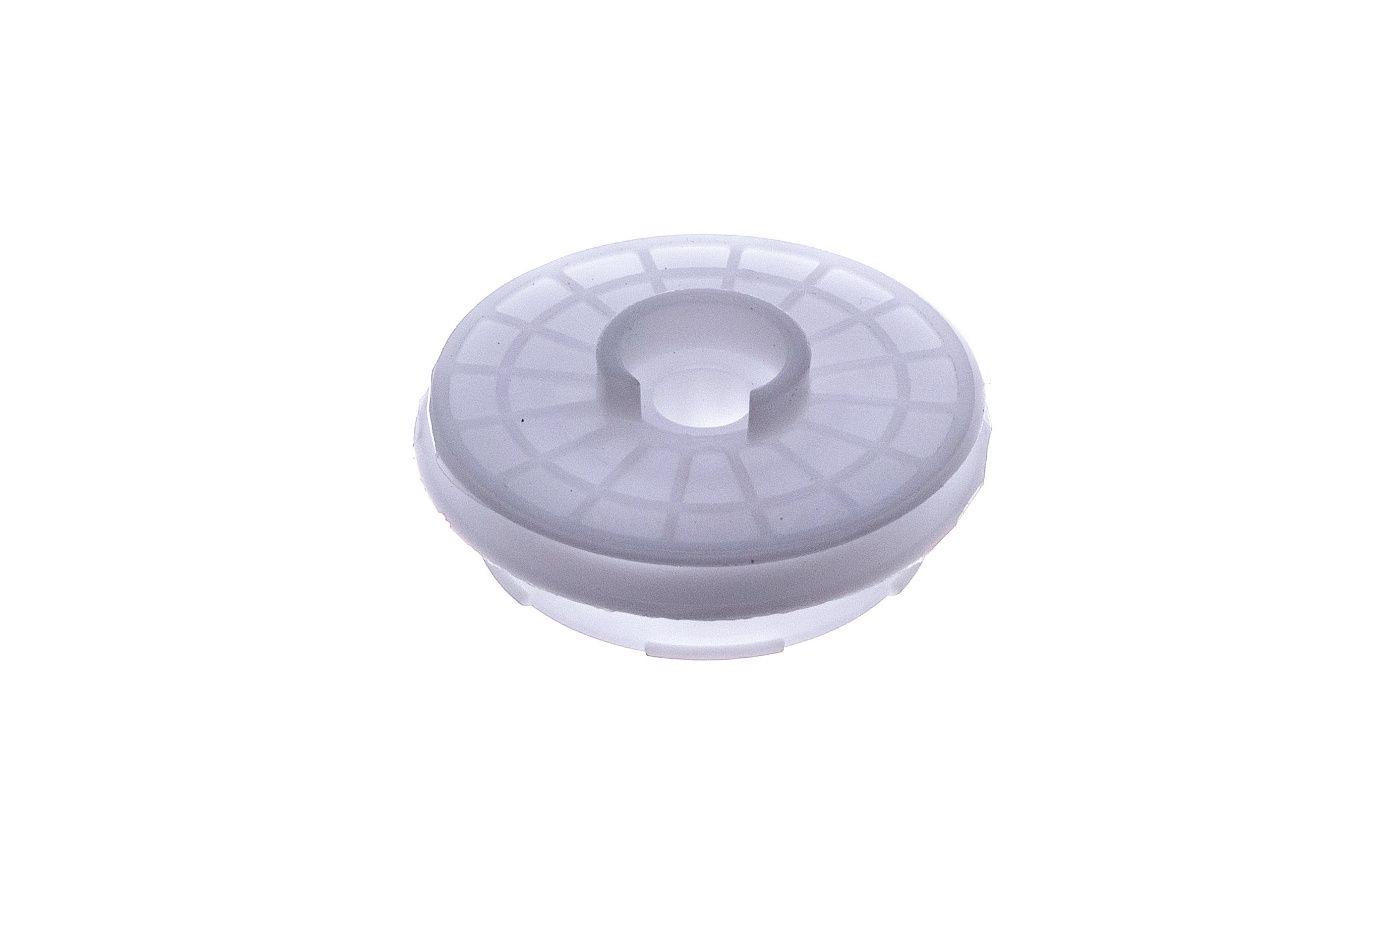 Štartovacie kladka Stihl FS120 FS38 FS45 BT120 FS400 - 4128 195 0400